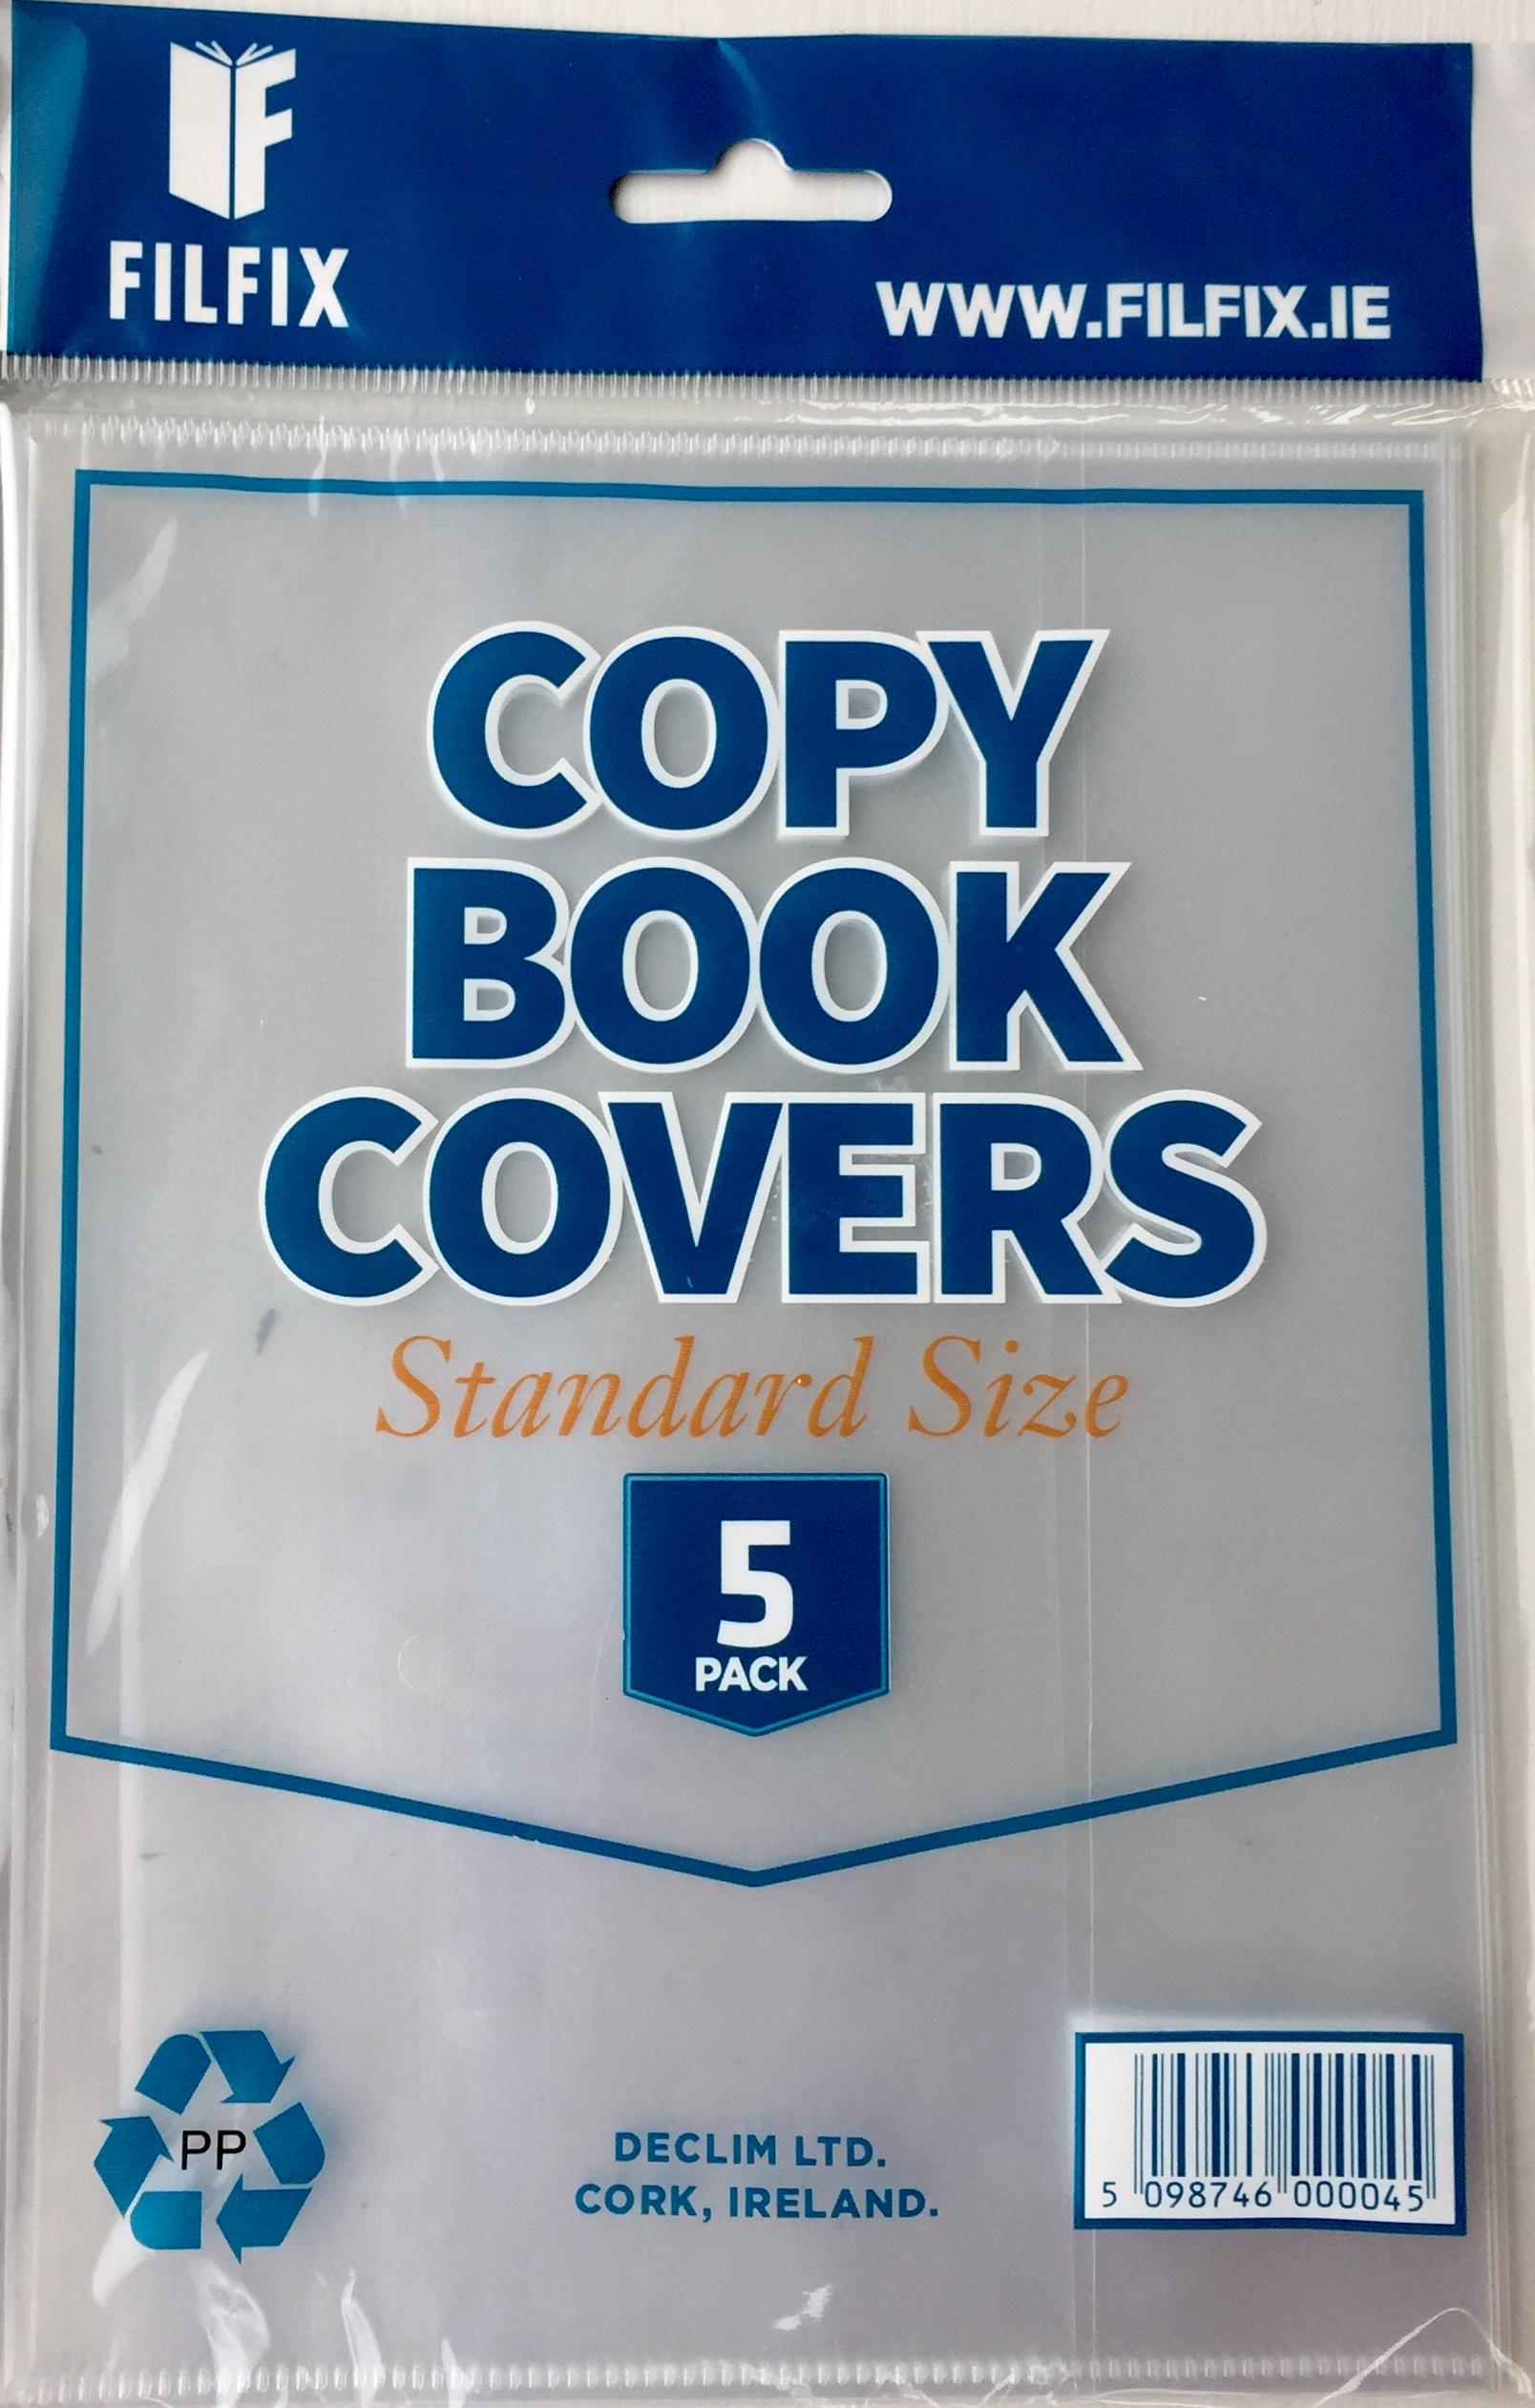 Filfix Copy Covers-Clear (5 Pack) Standard Size